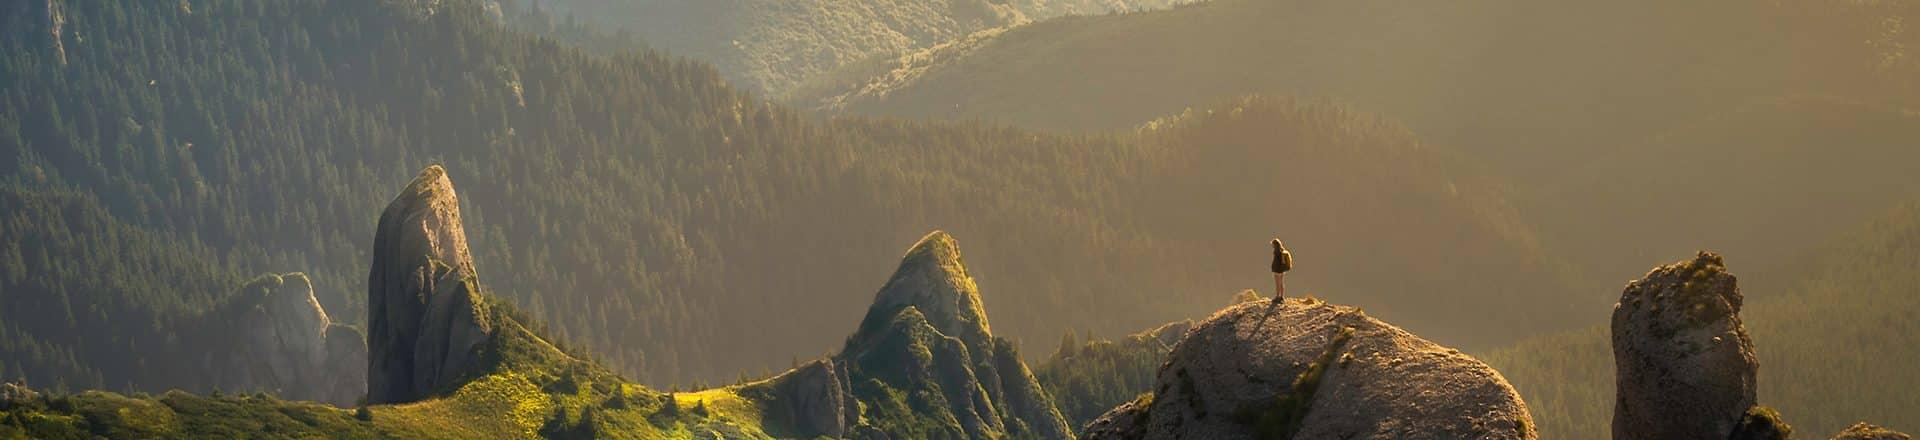 Altaï Travel